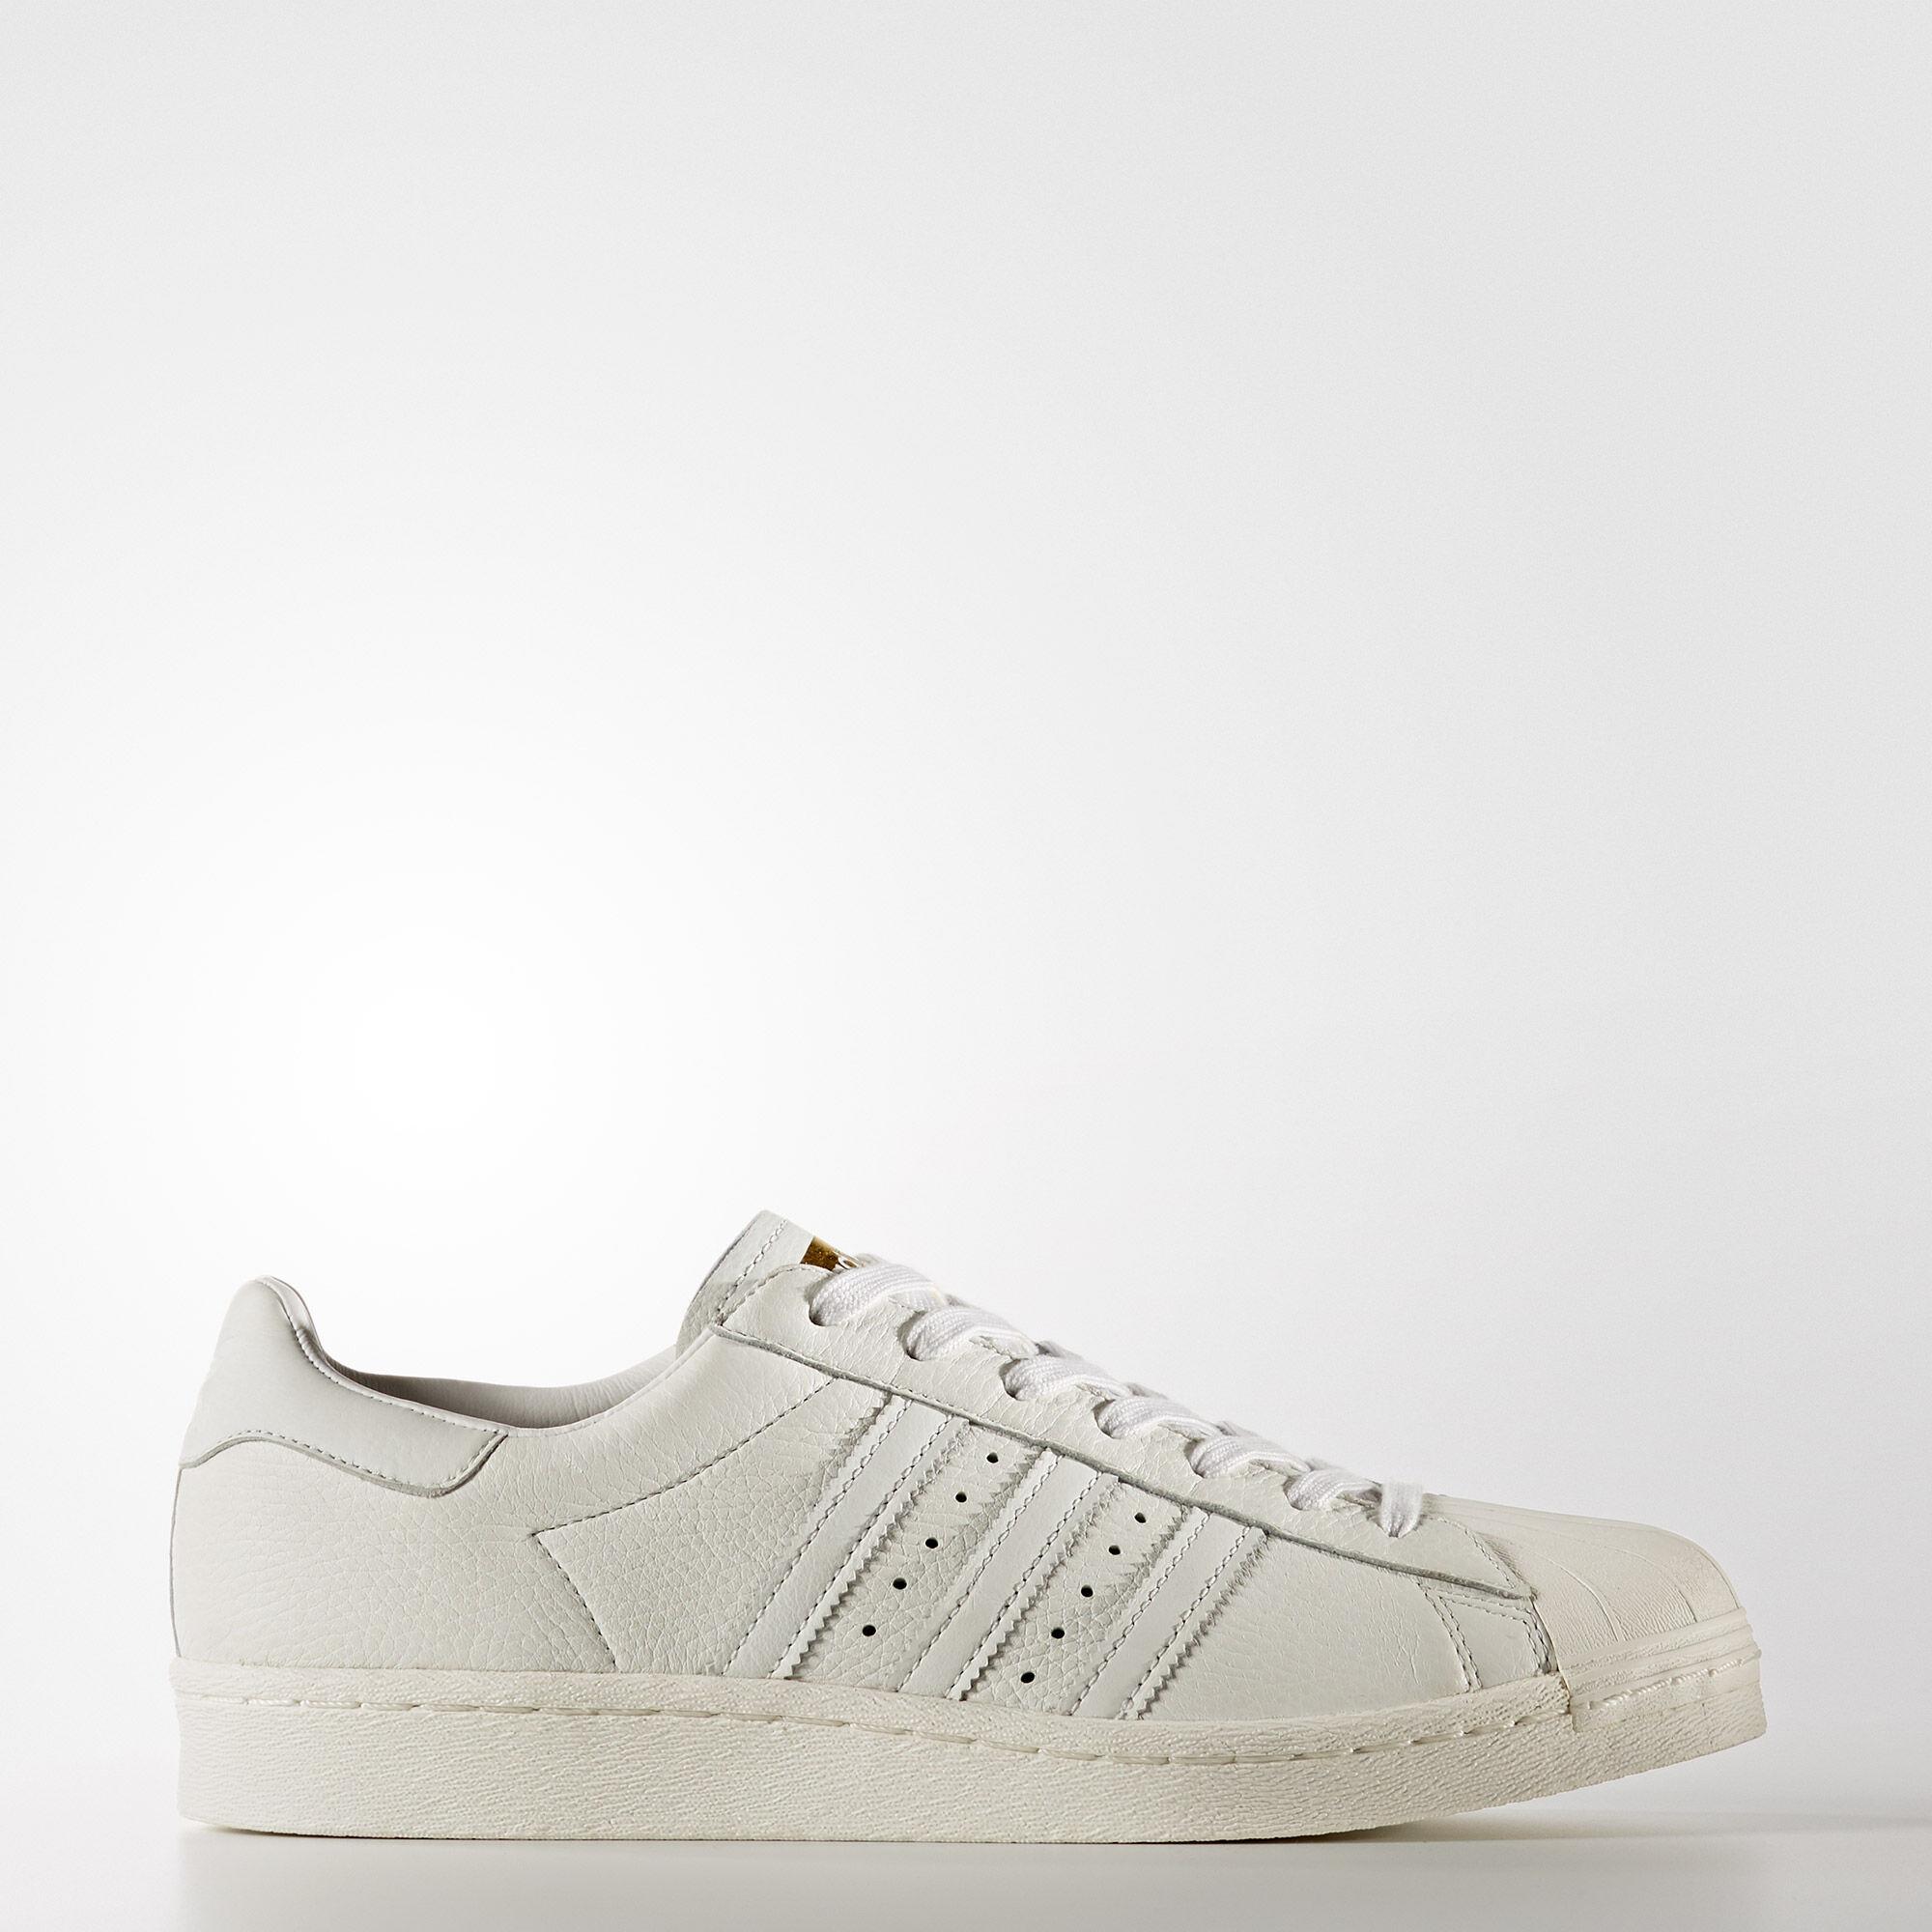 adidas Originals Men's Superstar Foundation Casual Sneaker